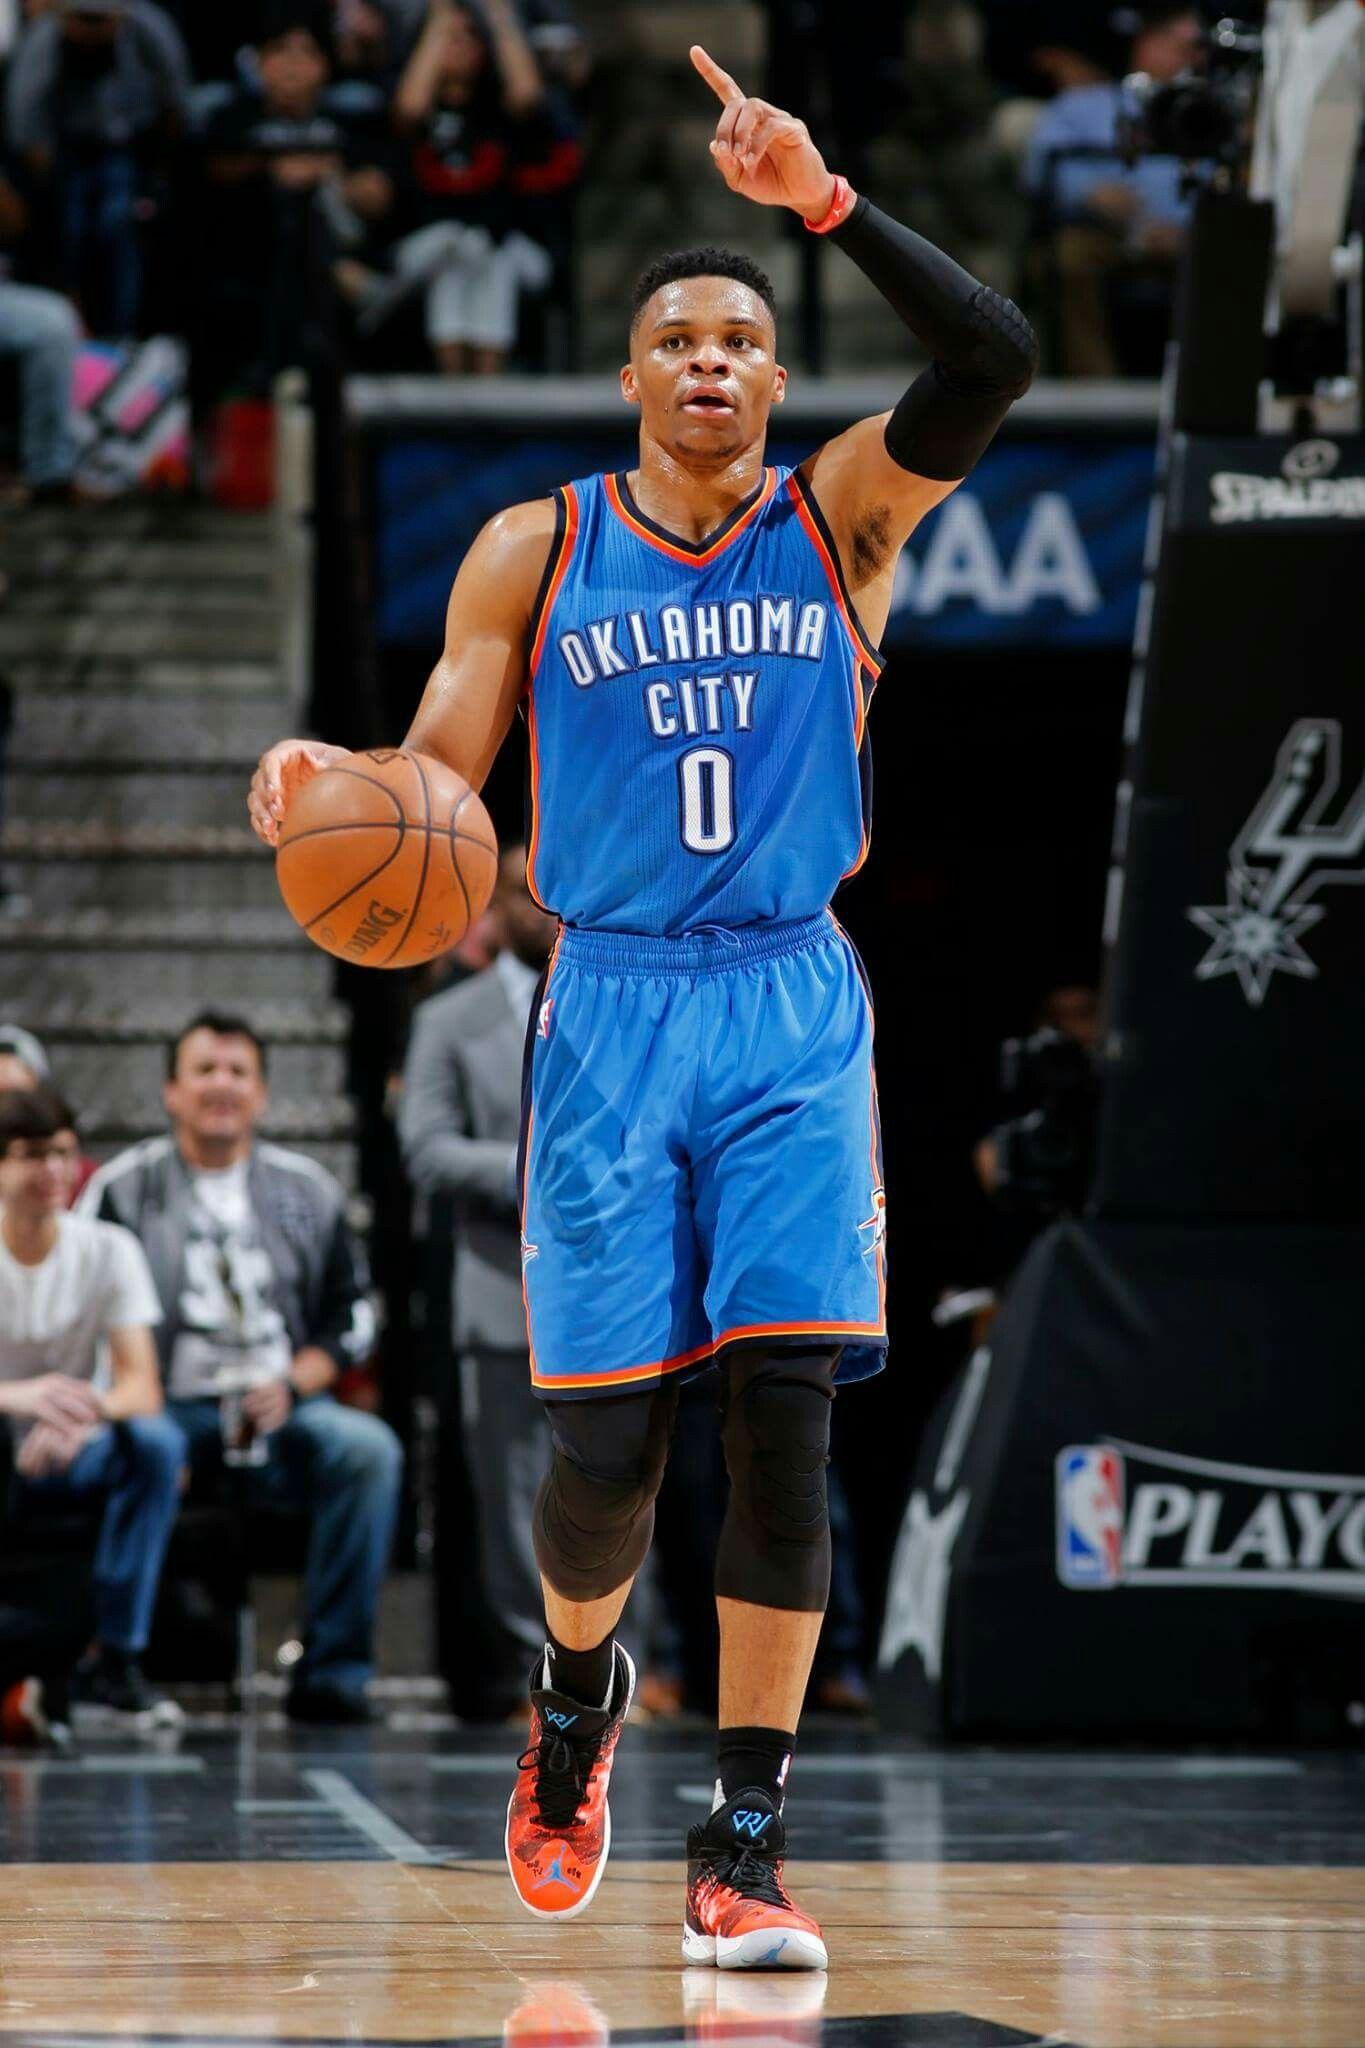 Russell Westbrook Okc thunder basketball, Nba players